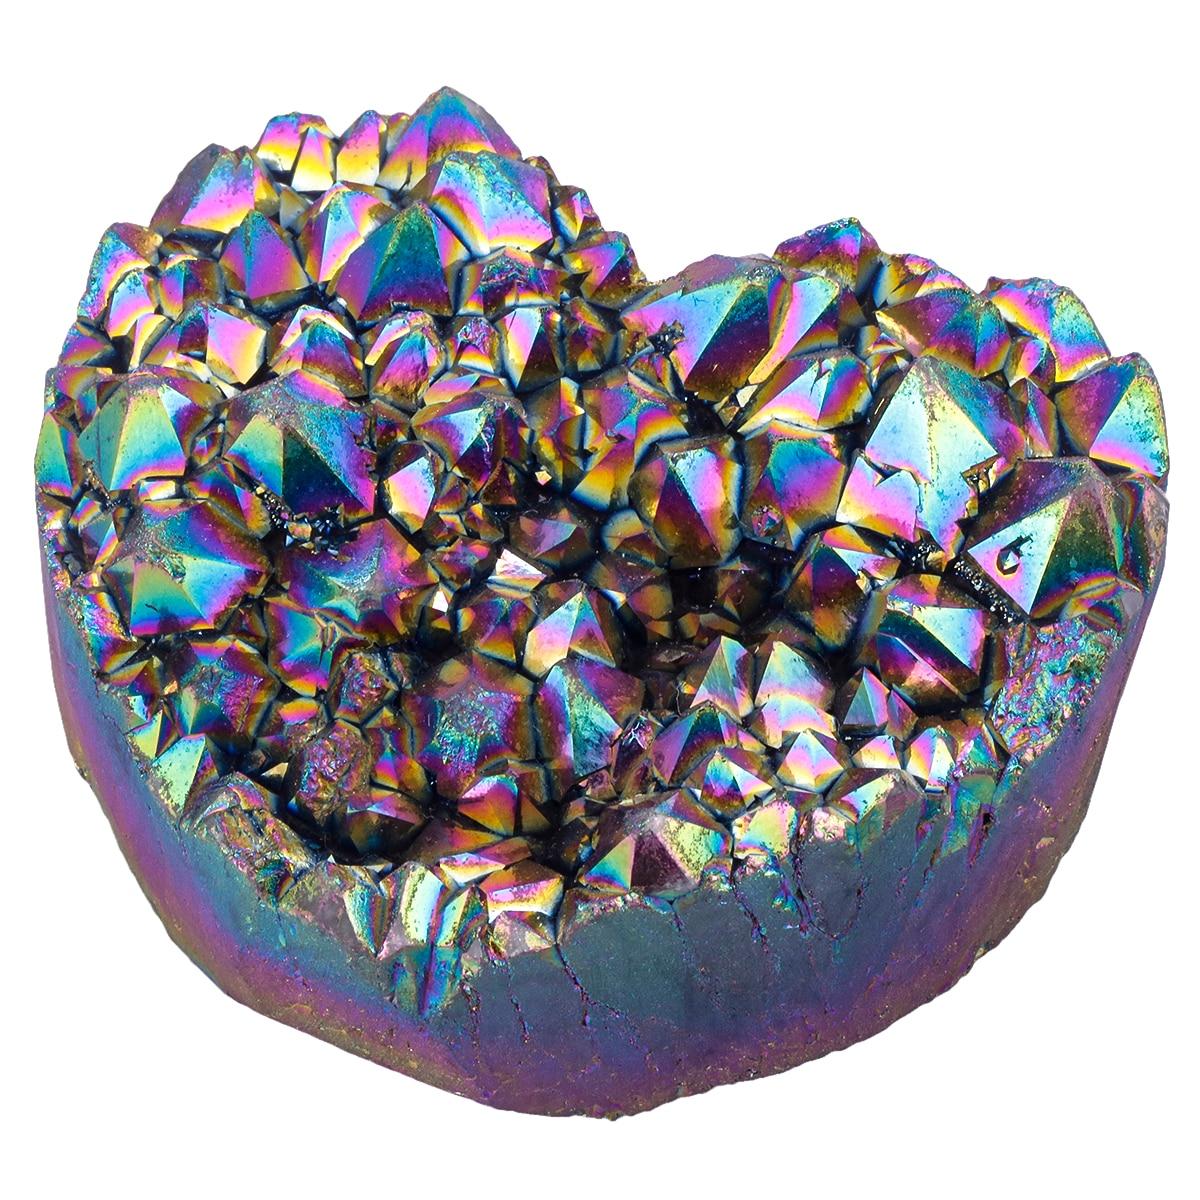 TUMBEELLUWA Heart Shape Rainbow Flame Aura Titanium Coated Natural Crystal Quartz Cluster Healing Geode Stone Specimen Figurine недорого